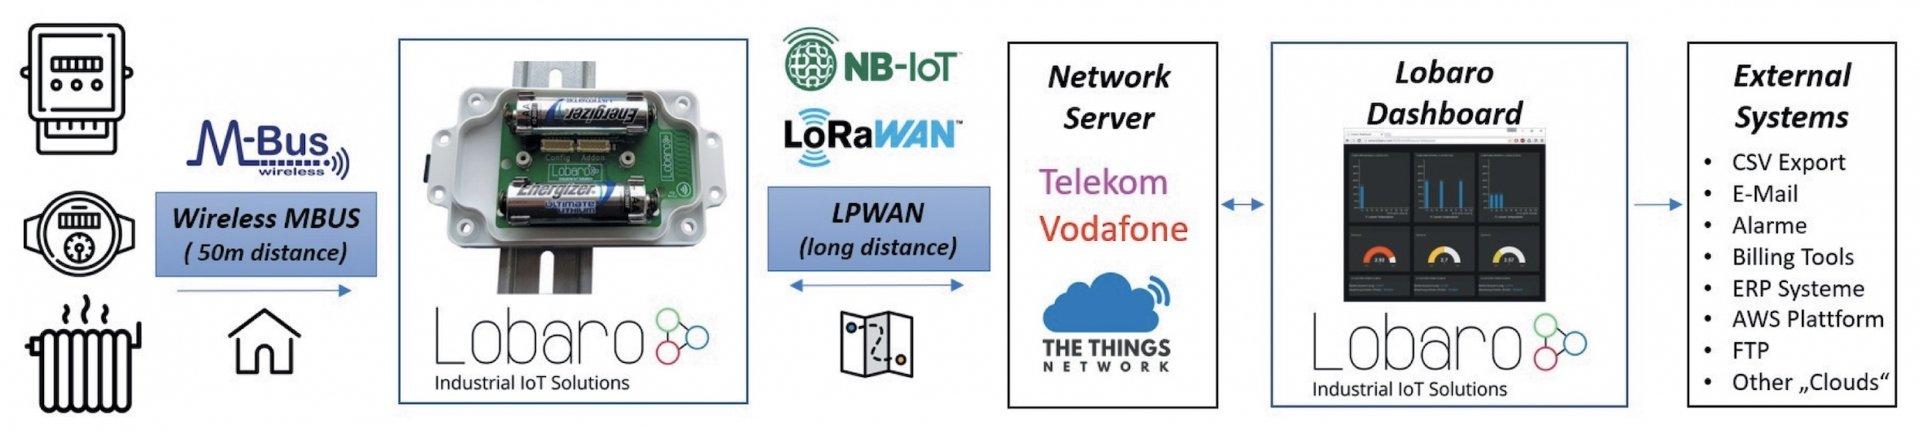 Wireless MBus über LoRaWAN Bridge (wMBUS LoRa) – Lobaro com